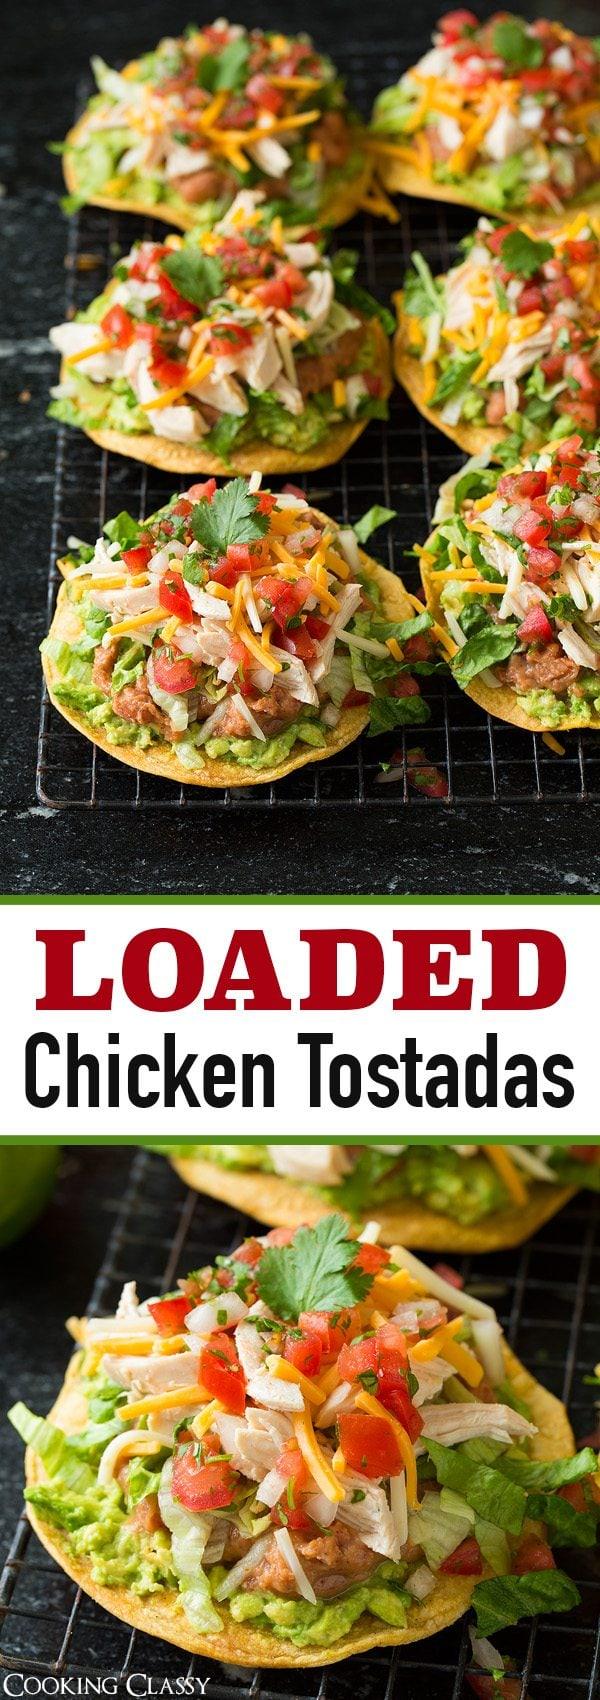 Chicken Guacamole and Bean Tostadas   Cooking Classy